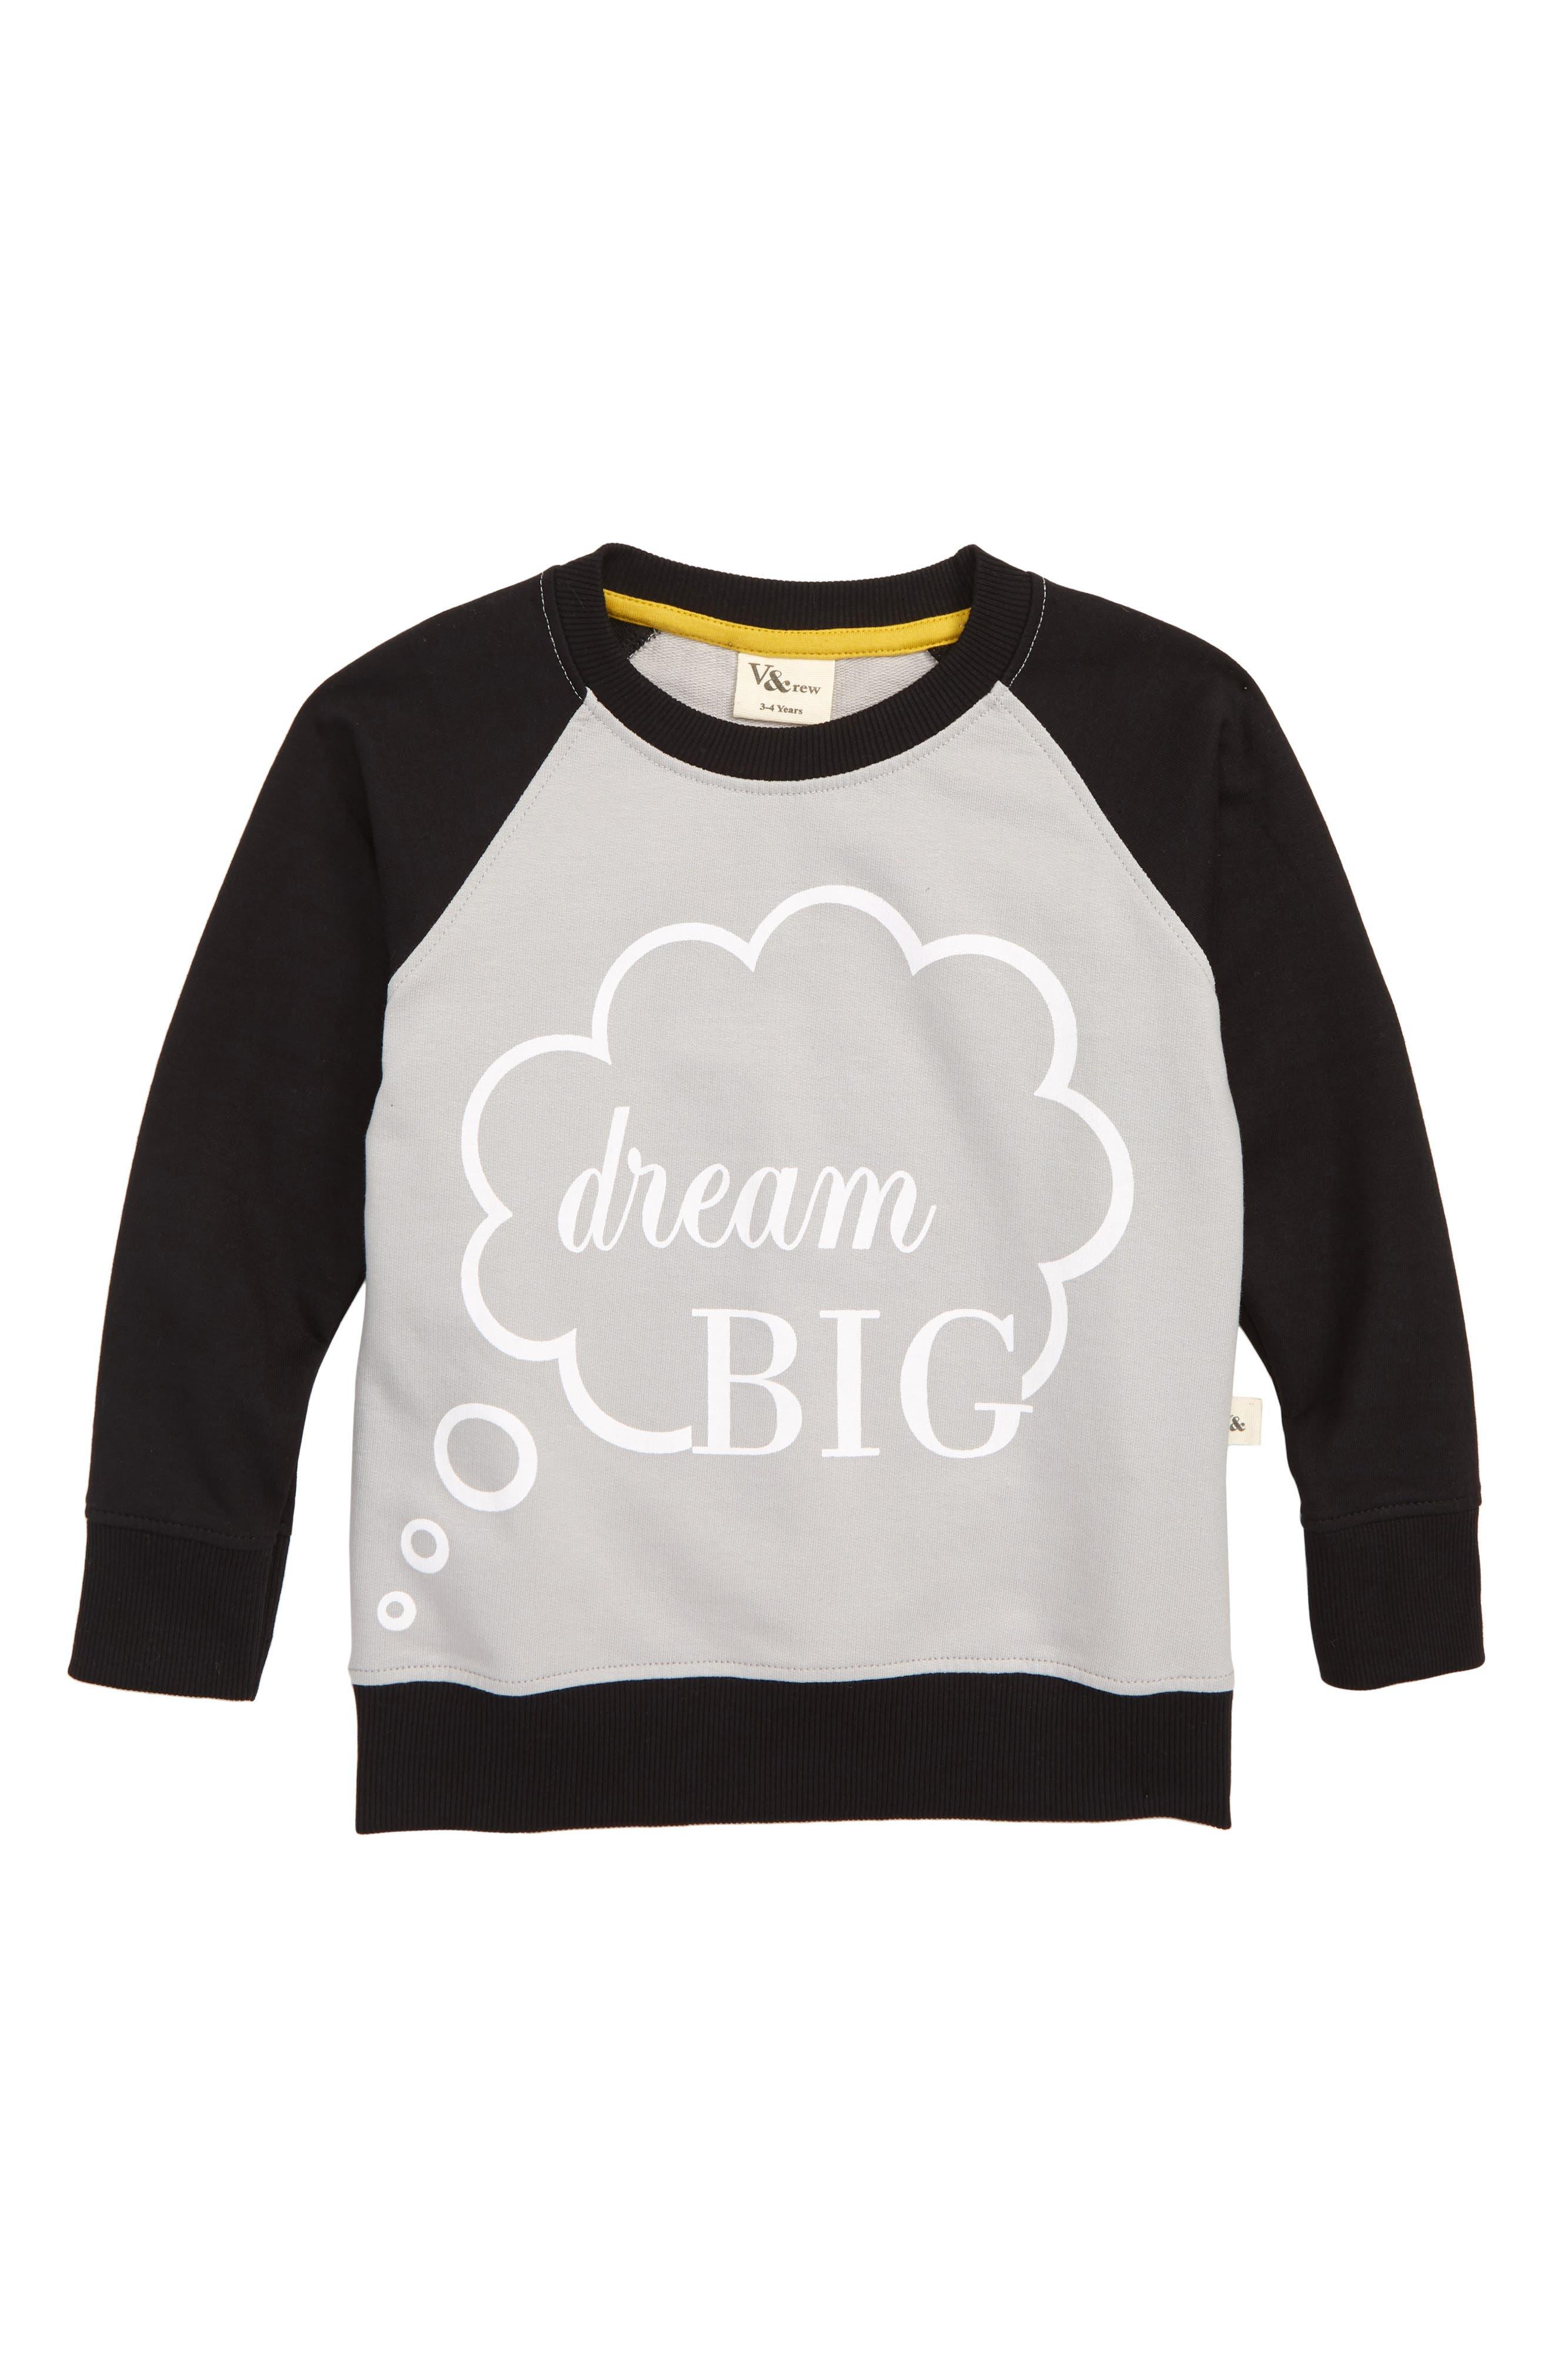 Boys Turtledove London Dream Big Raglan Sweatshirt